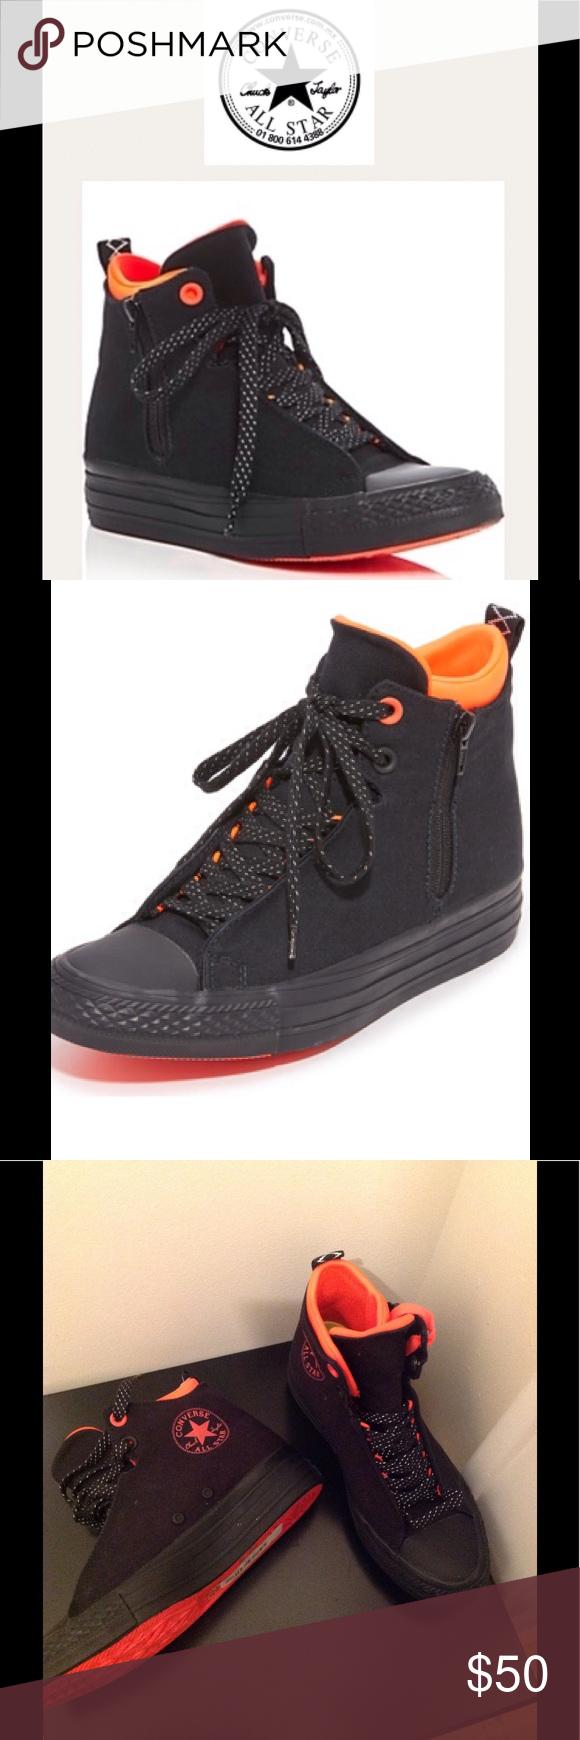 0720189f5327 NEW Chuck Taylor Selena bicolor high-top sneakers. NEW Chuck Taylor Selena  bicolor high-top sneaker set on rubber platform